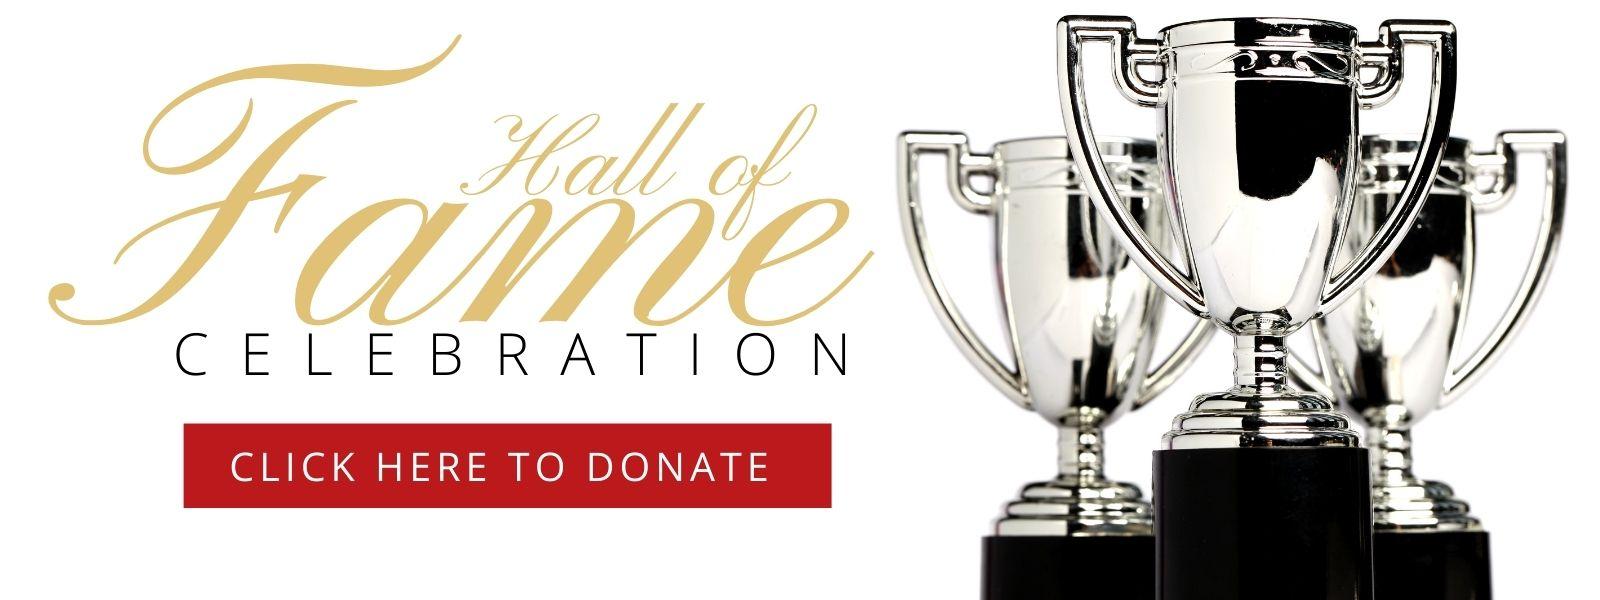 2021 Hall of Fame Celebration – Fund The Mission